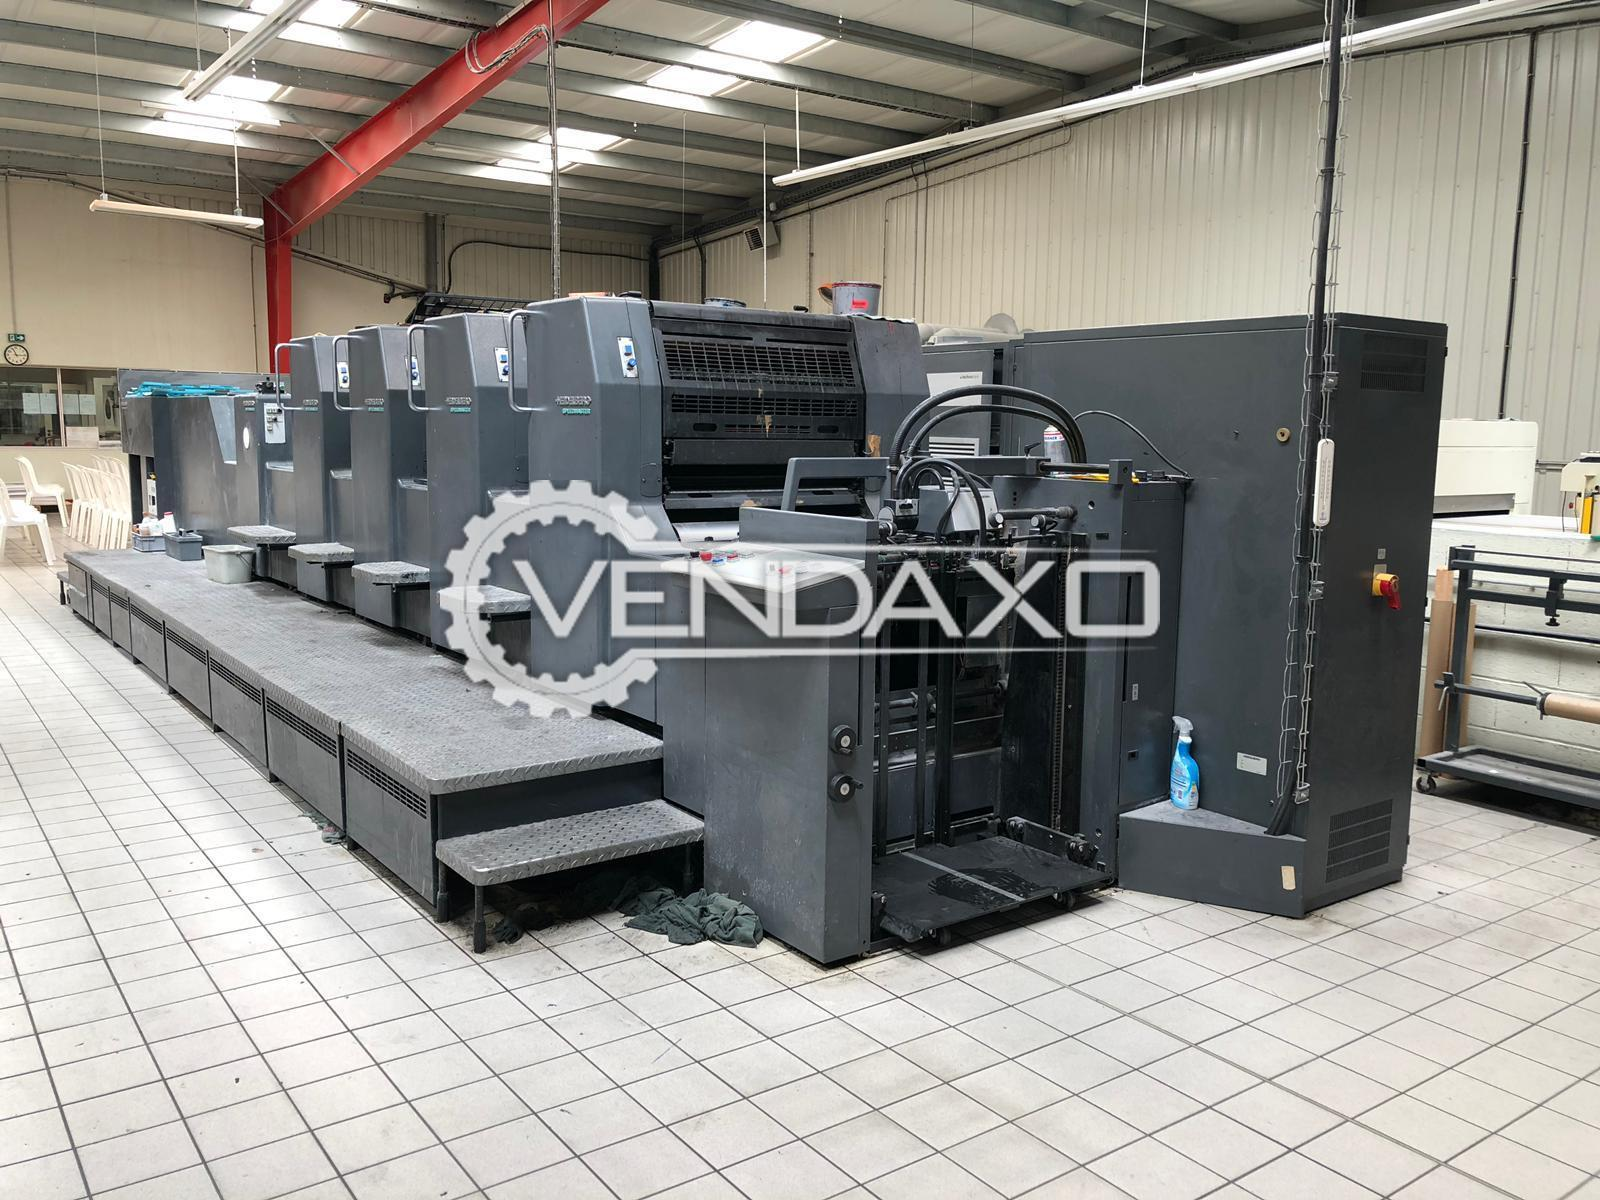 Heidelberg SM 74-4LX Offset Printing Machine - 20 x 29 Inch, 4 Color